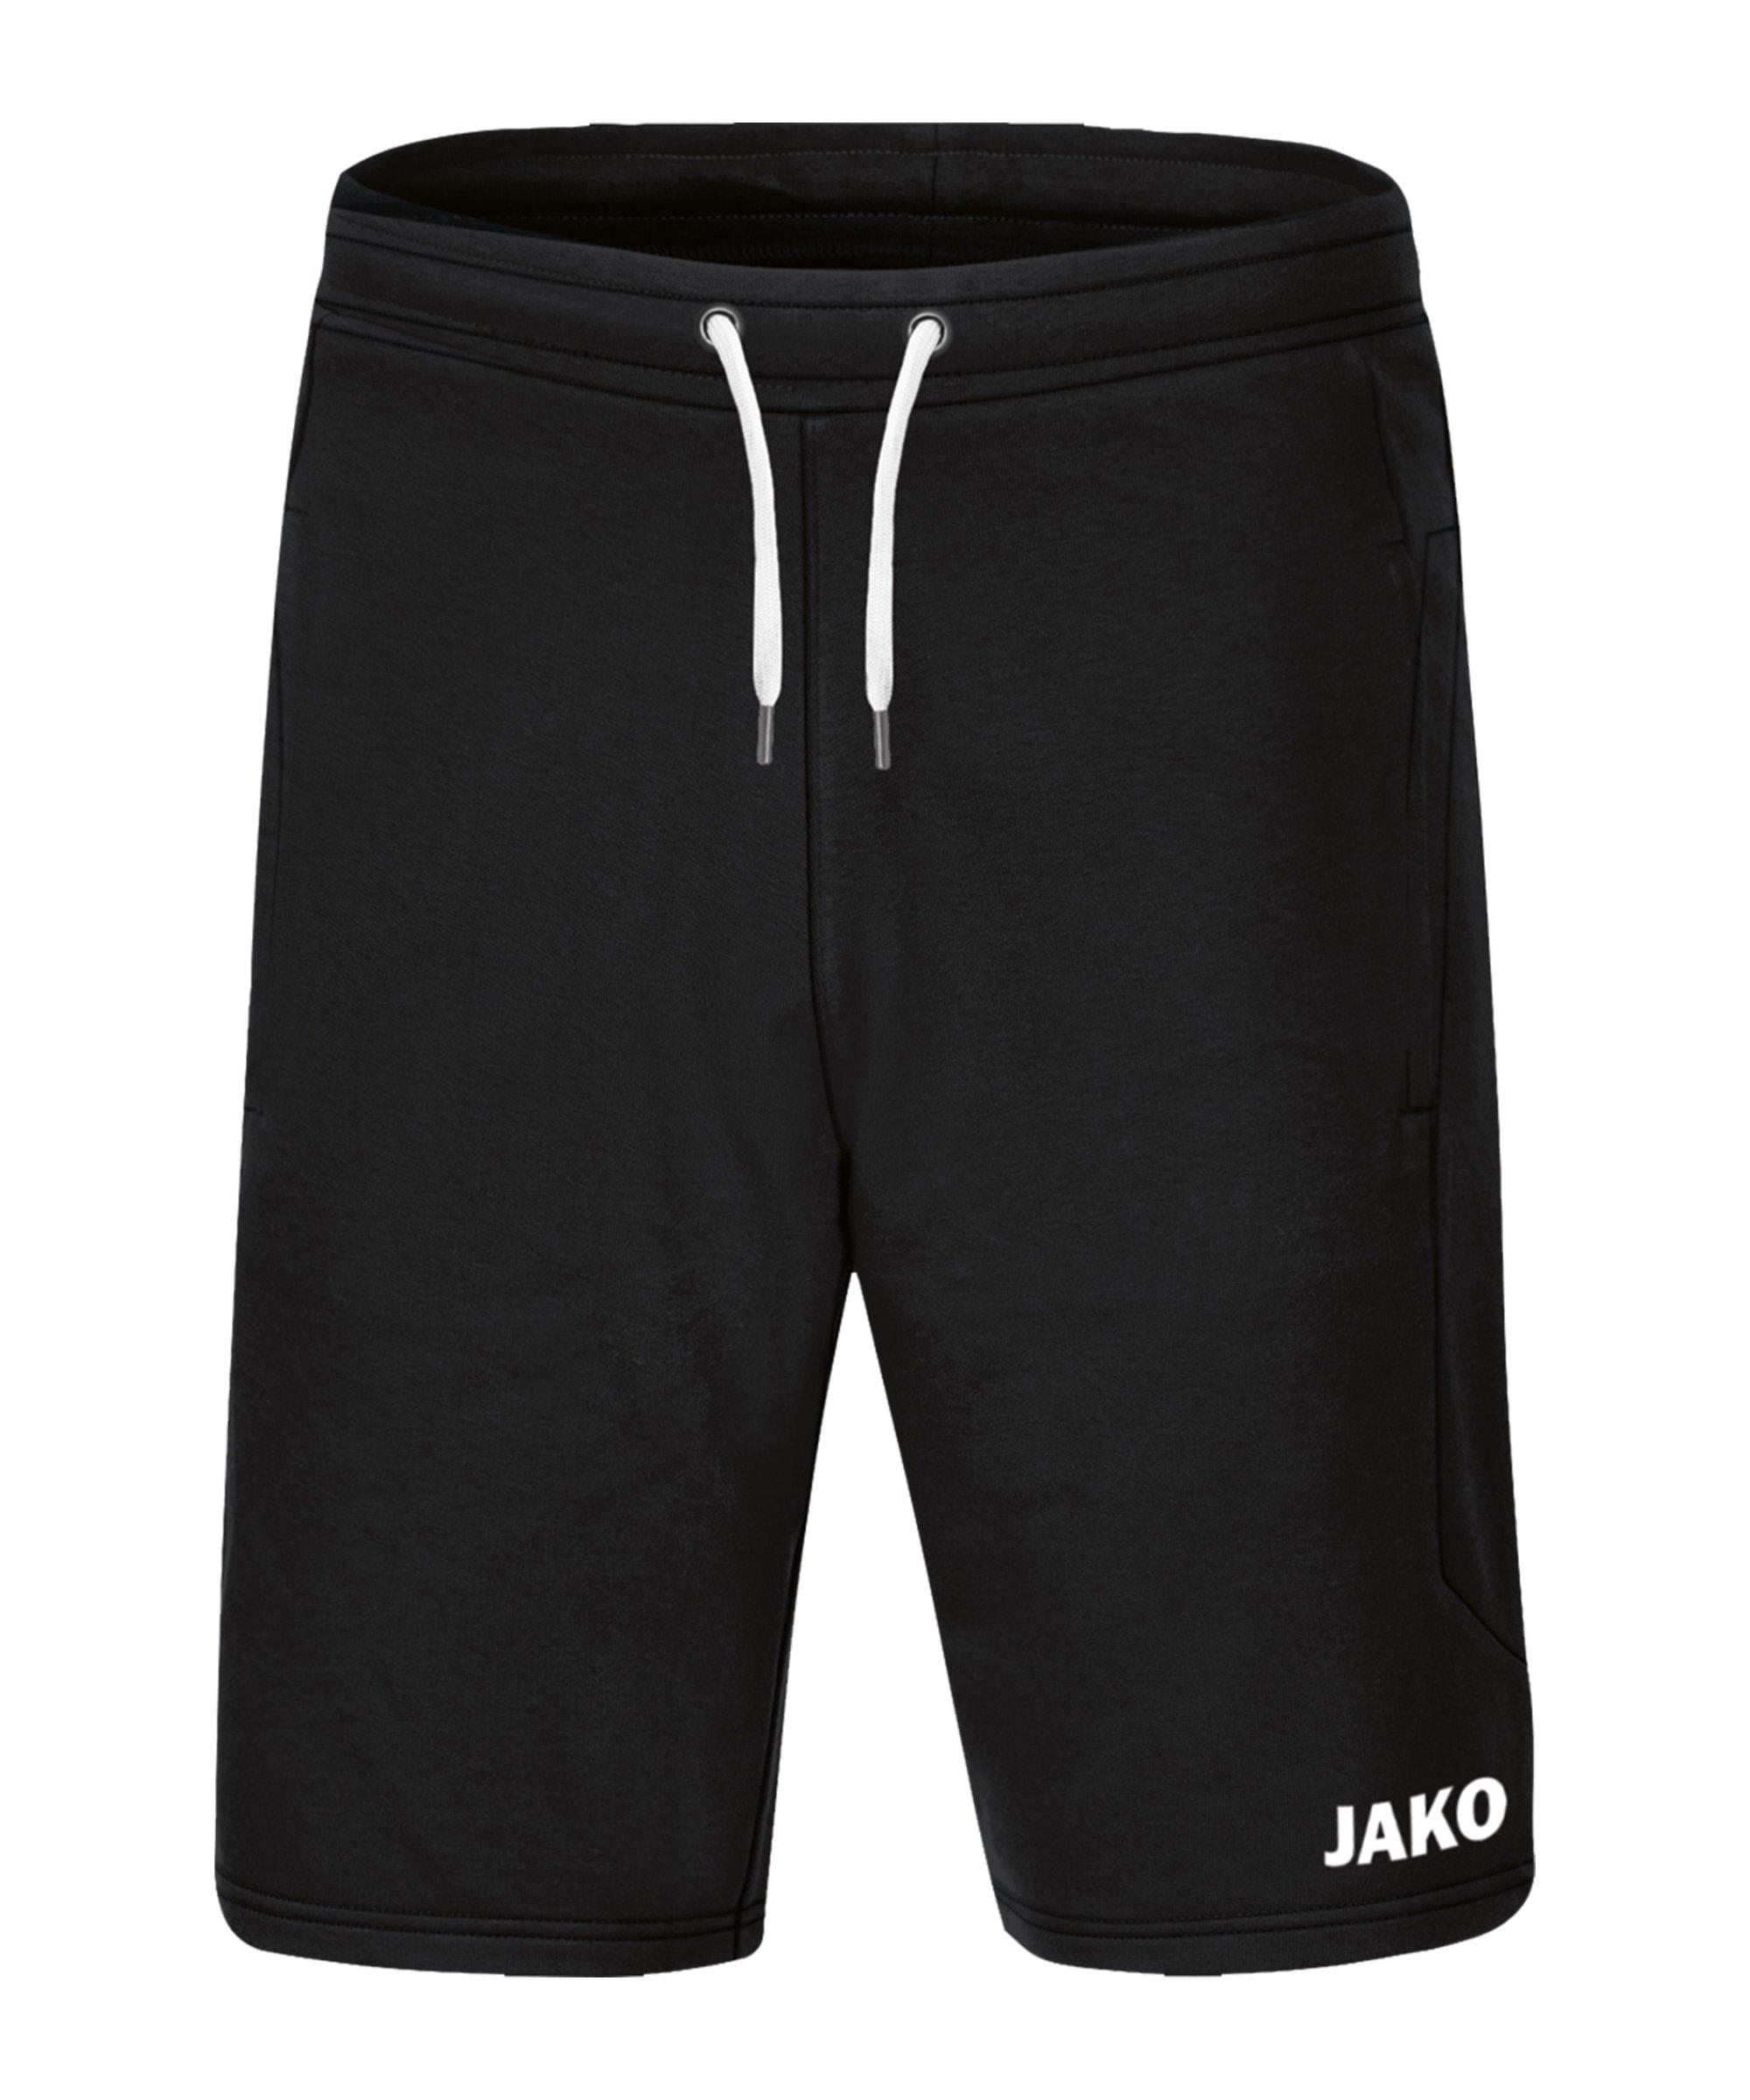 JAKO Base Short Kids Schwarz F08 - schwarz